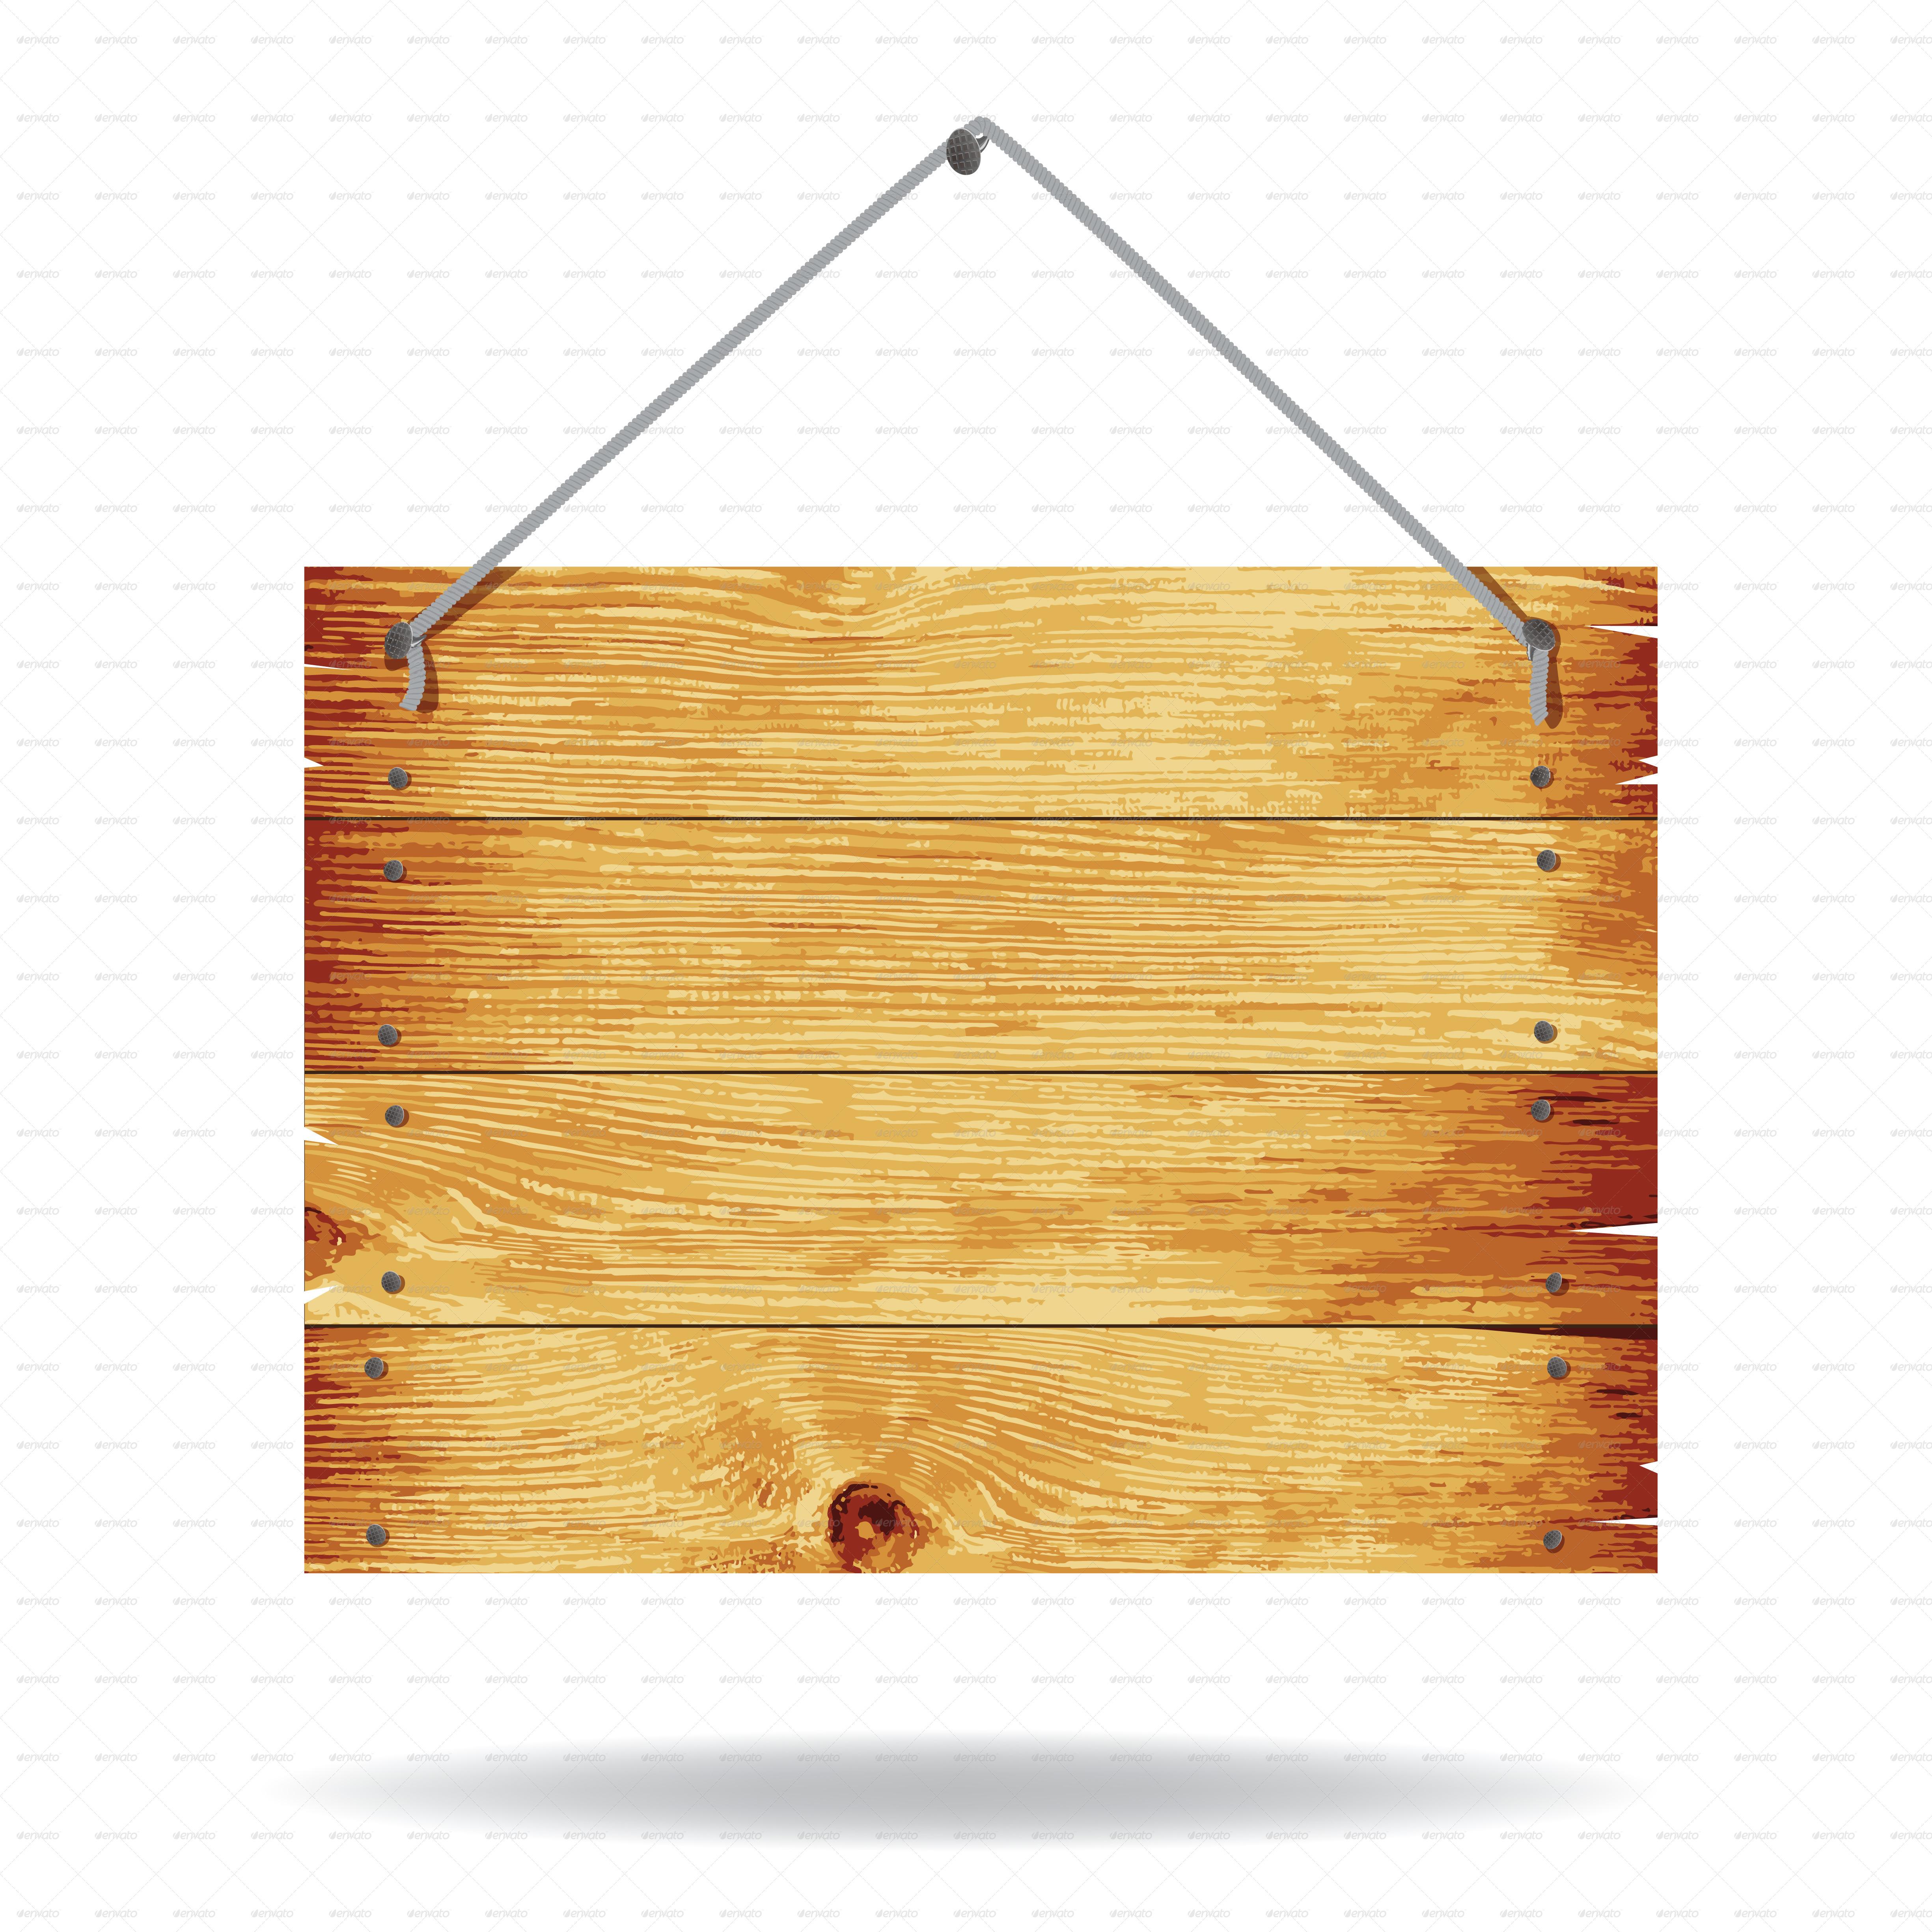 wooden sign by buriy graphicriver. Black Bedroom Furniture Sets. Home Design Ideas